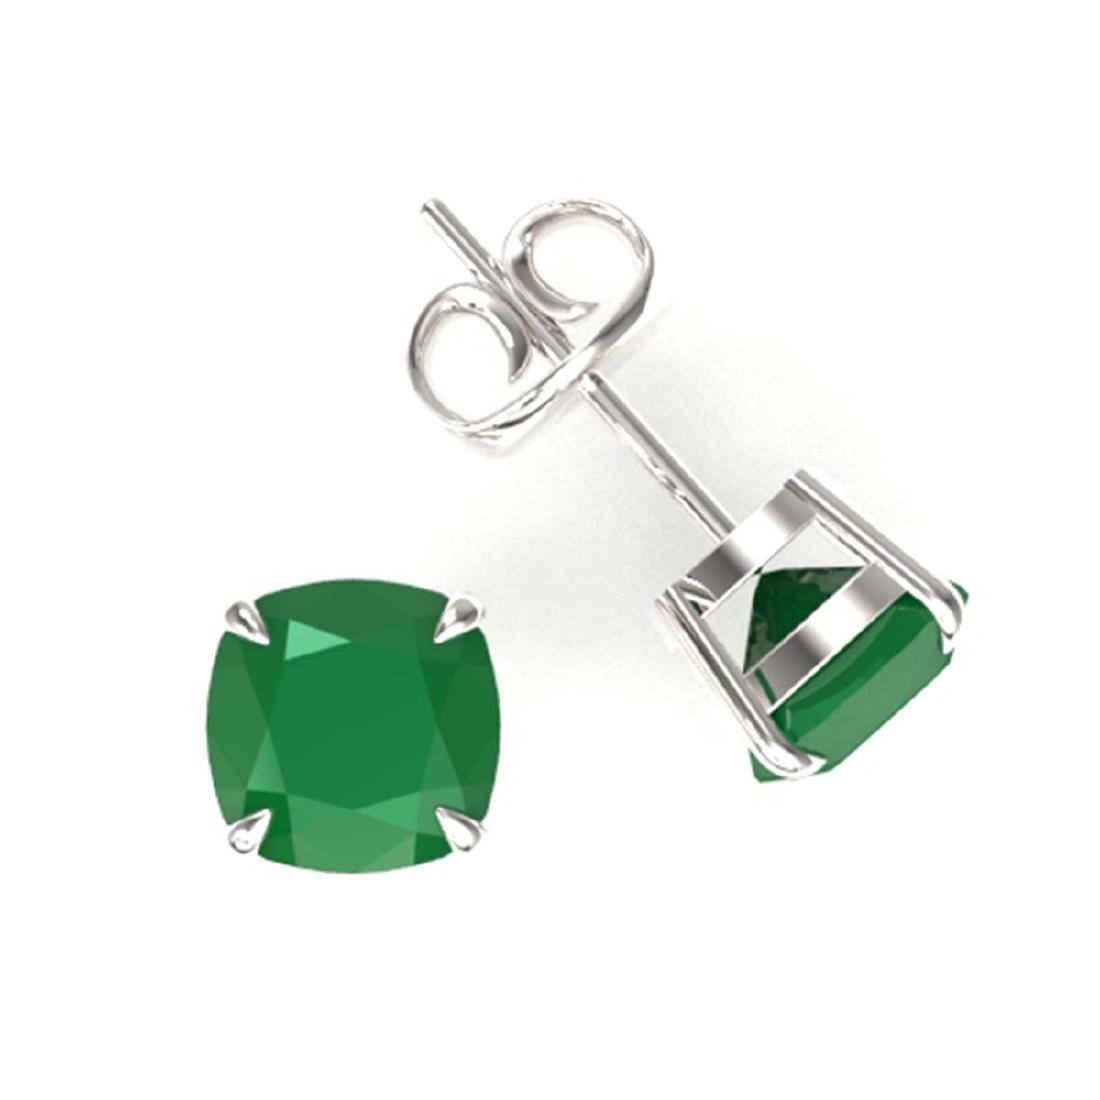 4 ctw Cushion Cut Emerald Stud Earrings 18K White Gold - 2